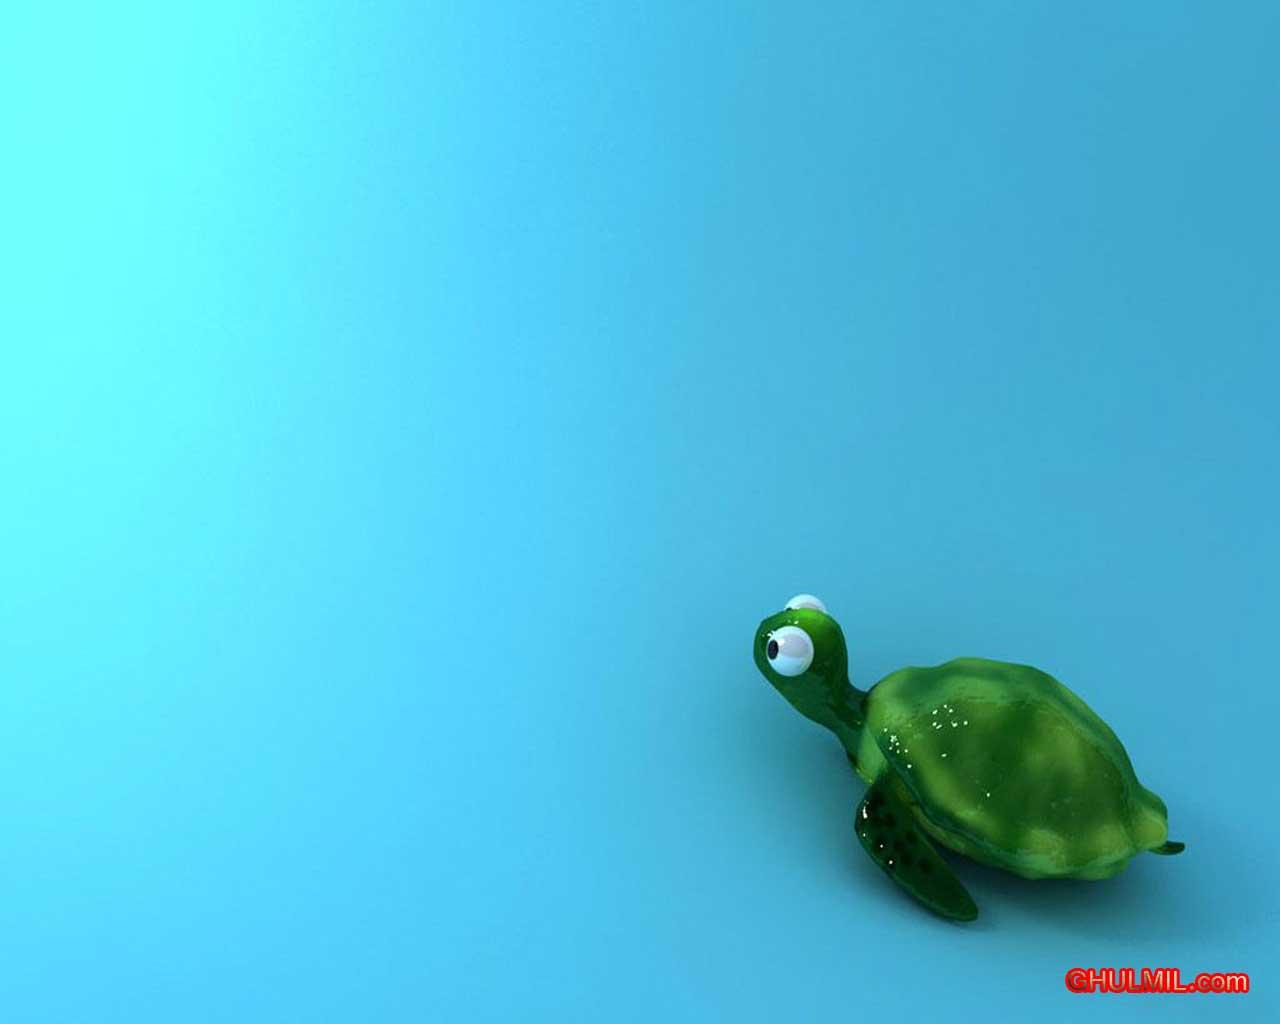 3D Cute Wallpapers For Desktop